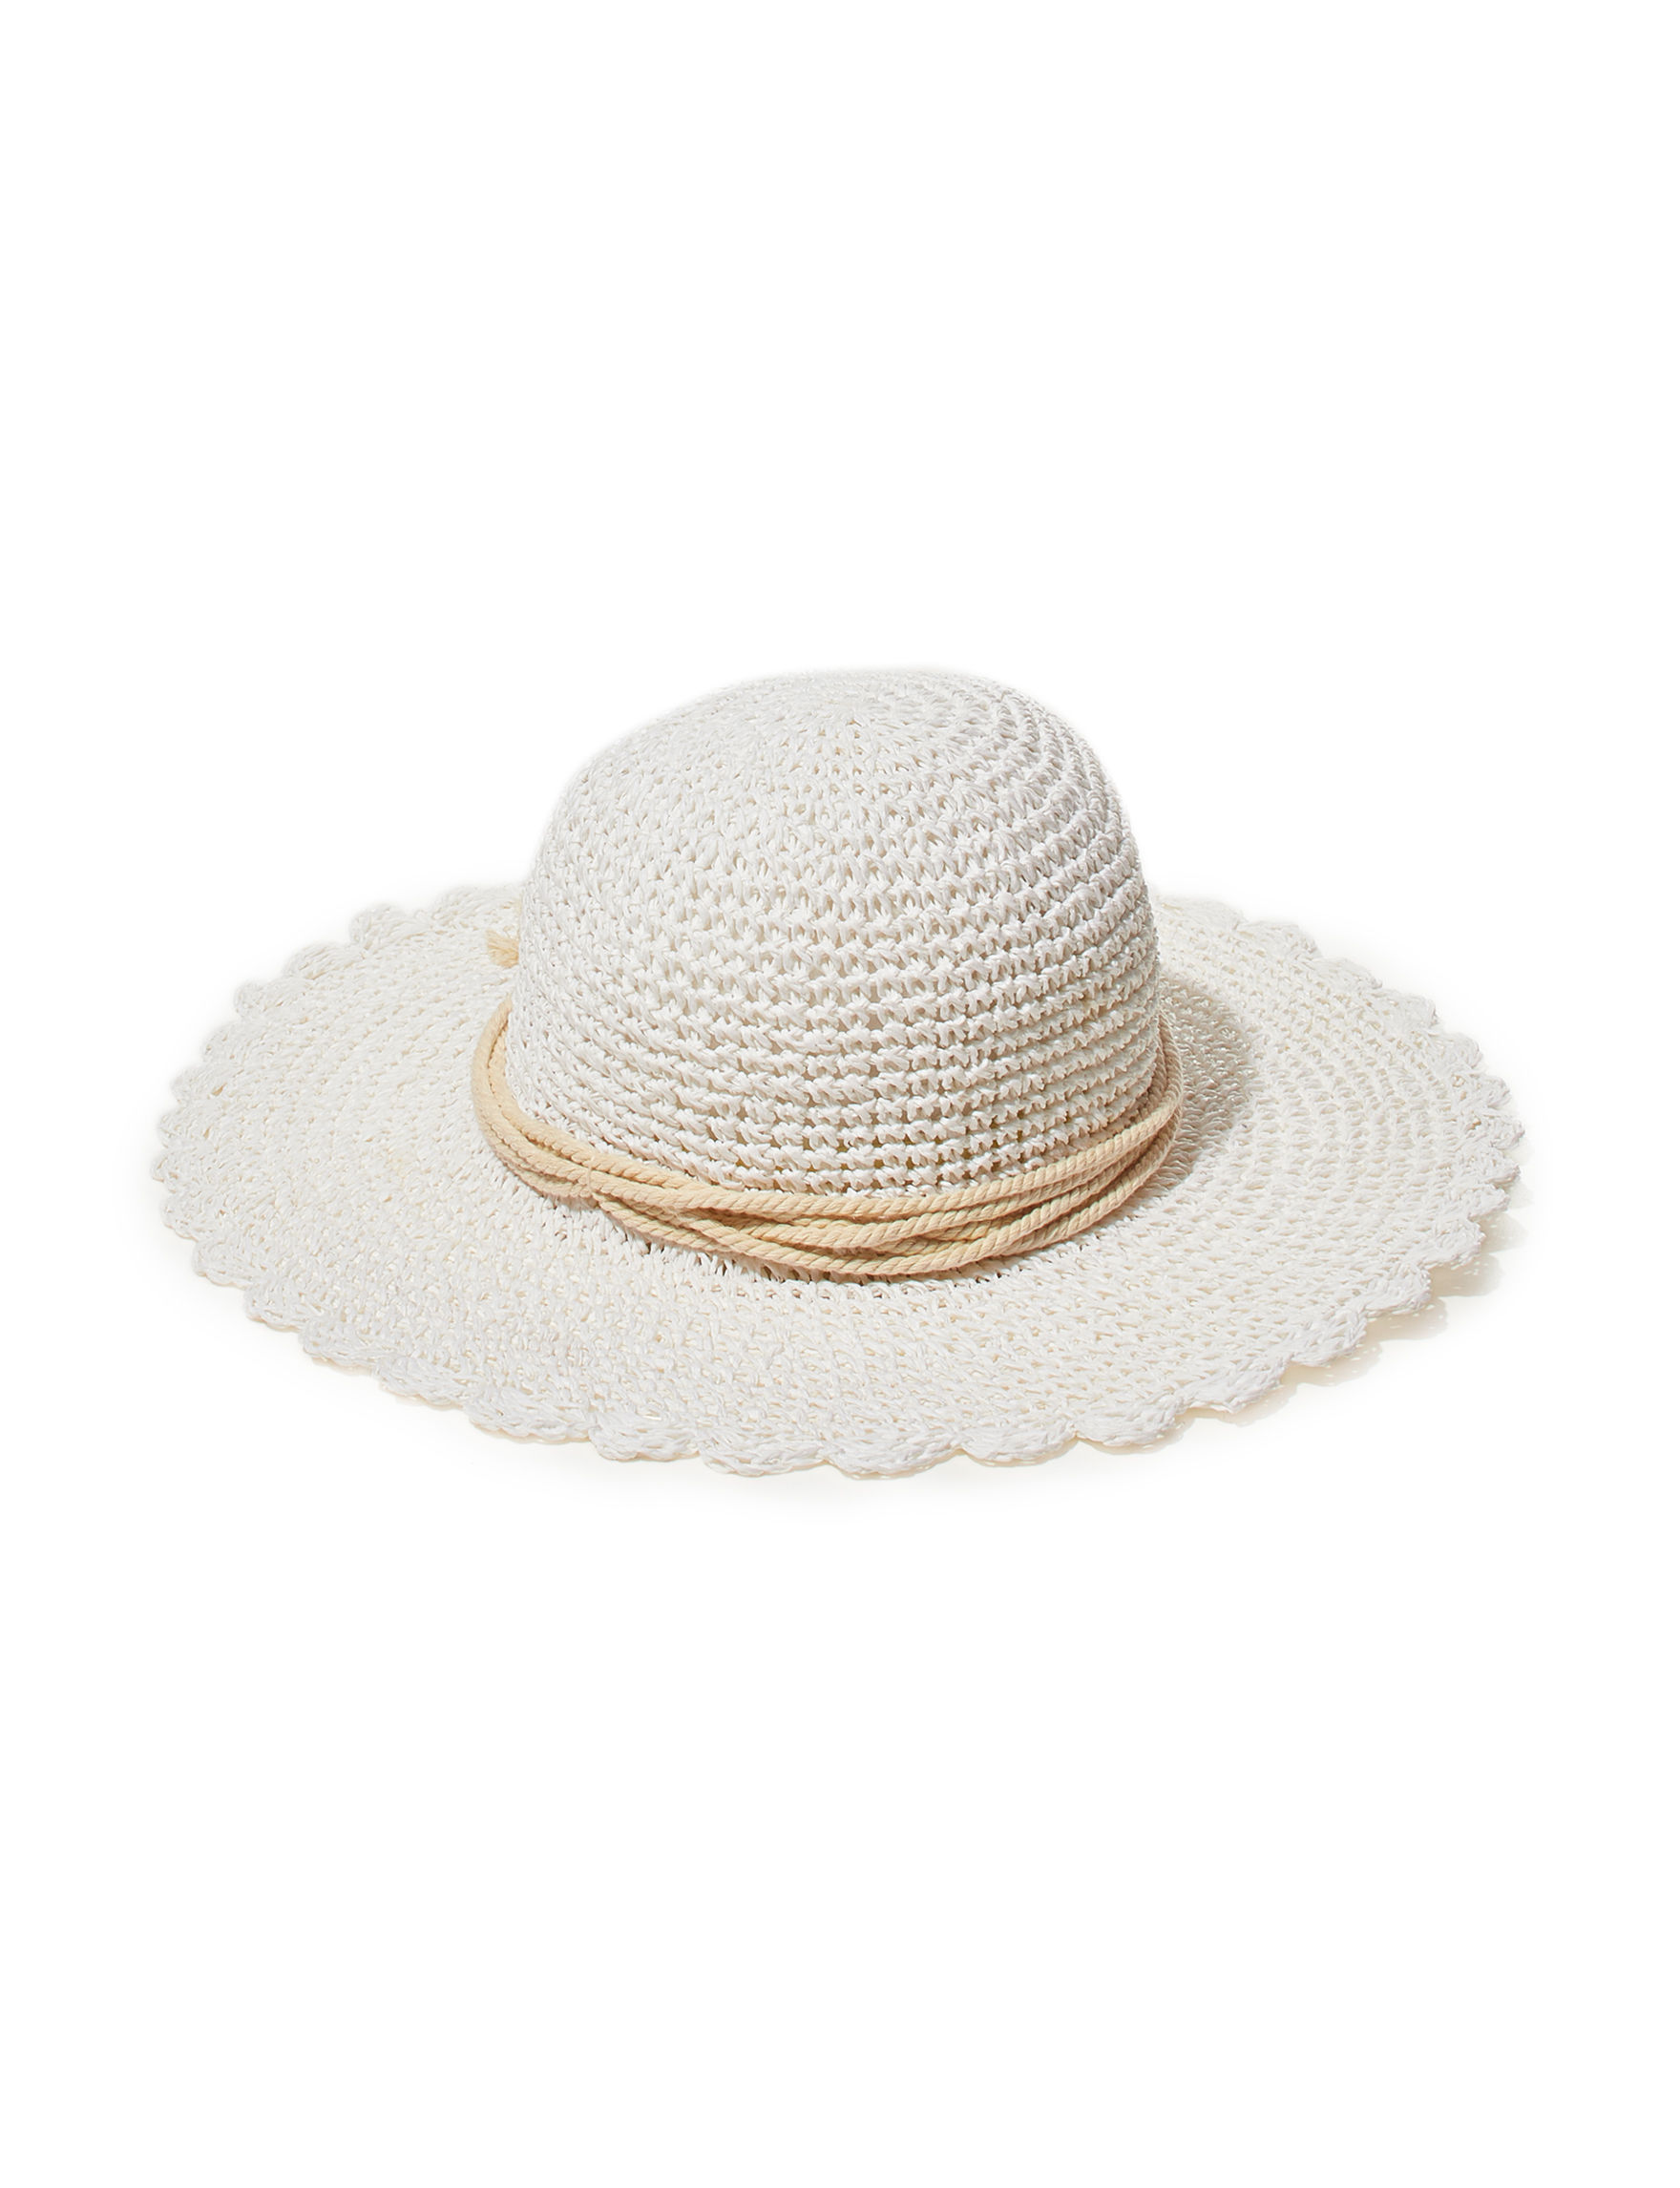 Amiee Lynn White Hats & Headwear